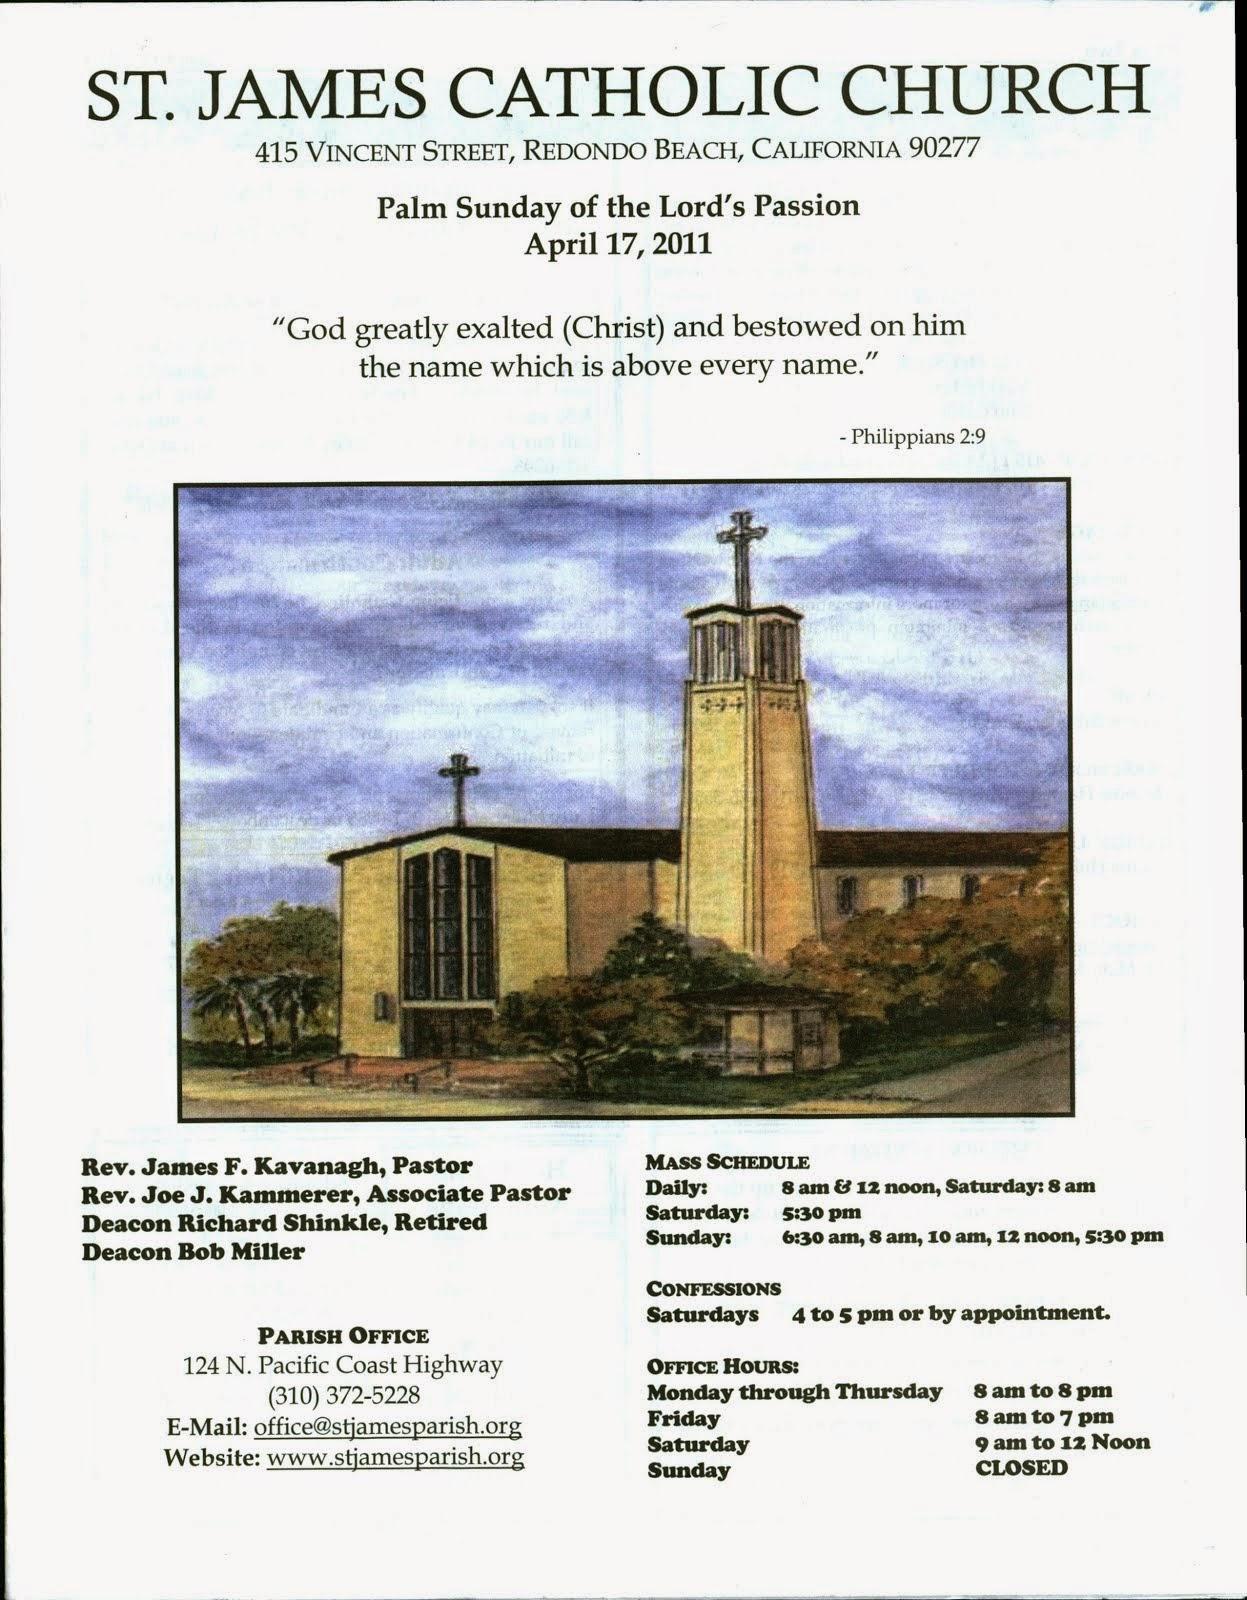 st james redondo beach – MY CHURCH BULLETINS